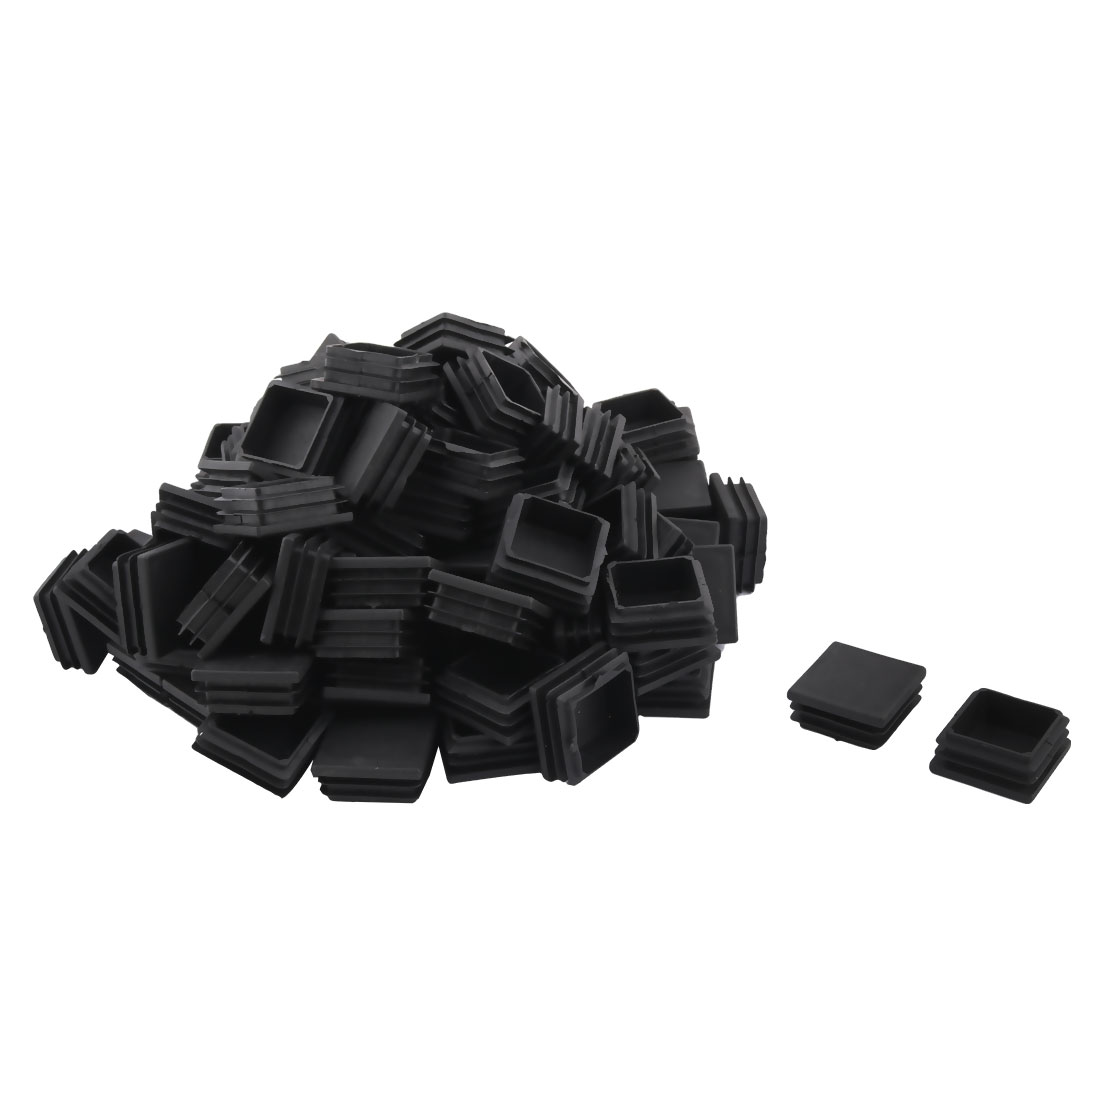 Plastic Square Design Tube Insert End Blanking Cover Cap Black 38 x 38mm 100pcs